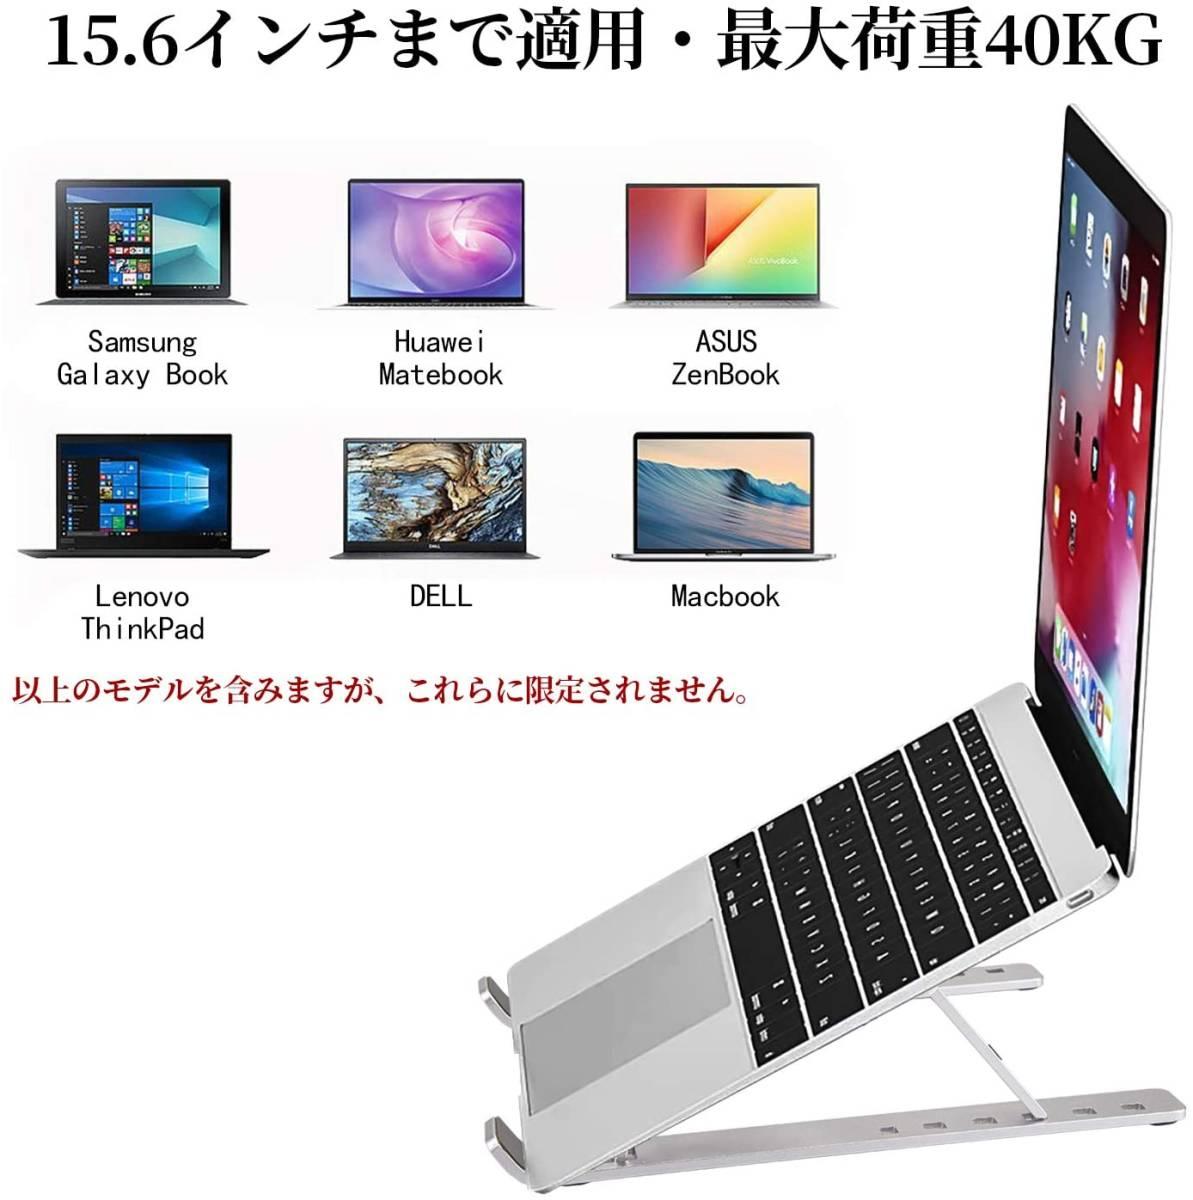 ENLOY PCスタンド ノートパソコン スタンド ラップトップスタンド 折りたたみ式 タブレットスタンド 15.6インチまで 収納袋付き シルバー